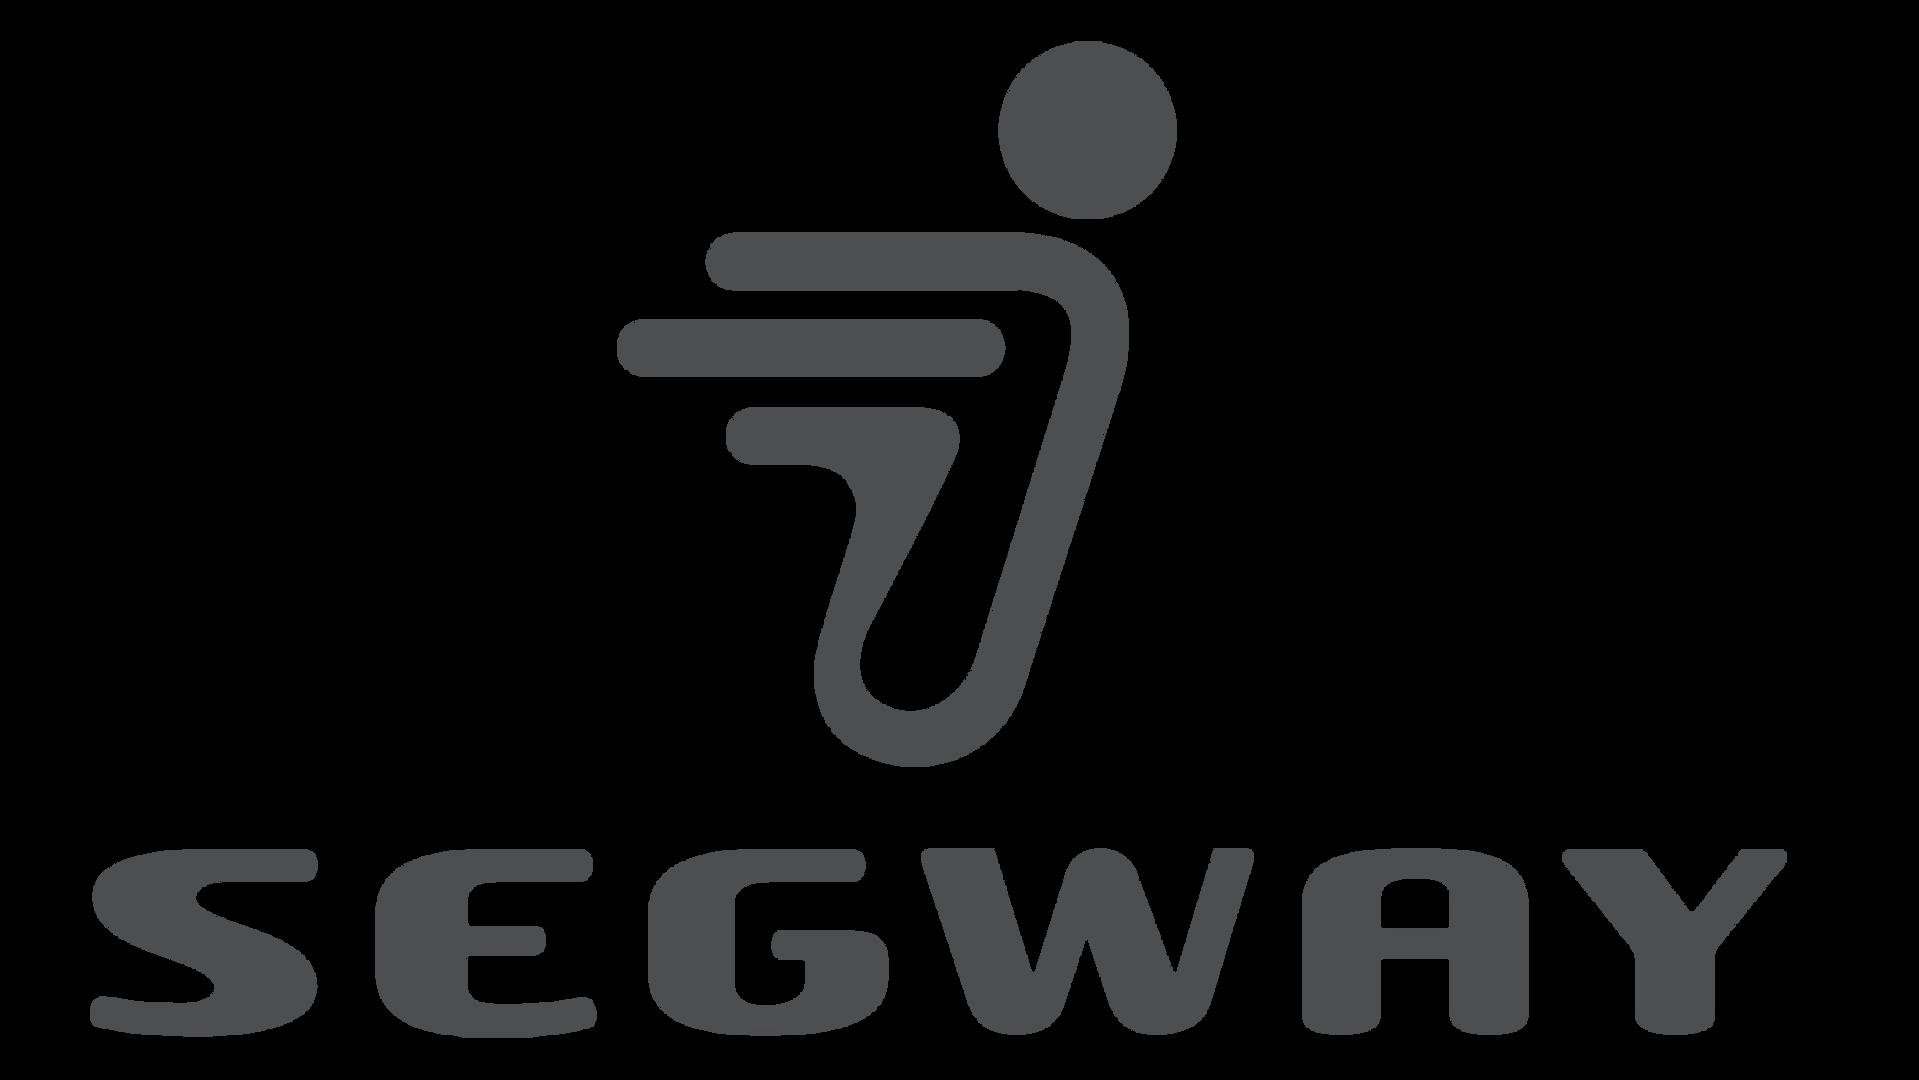 Segway-logo-wordmark.png